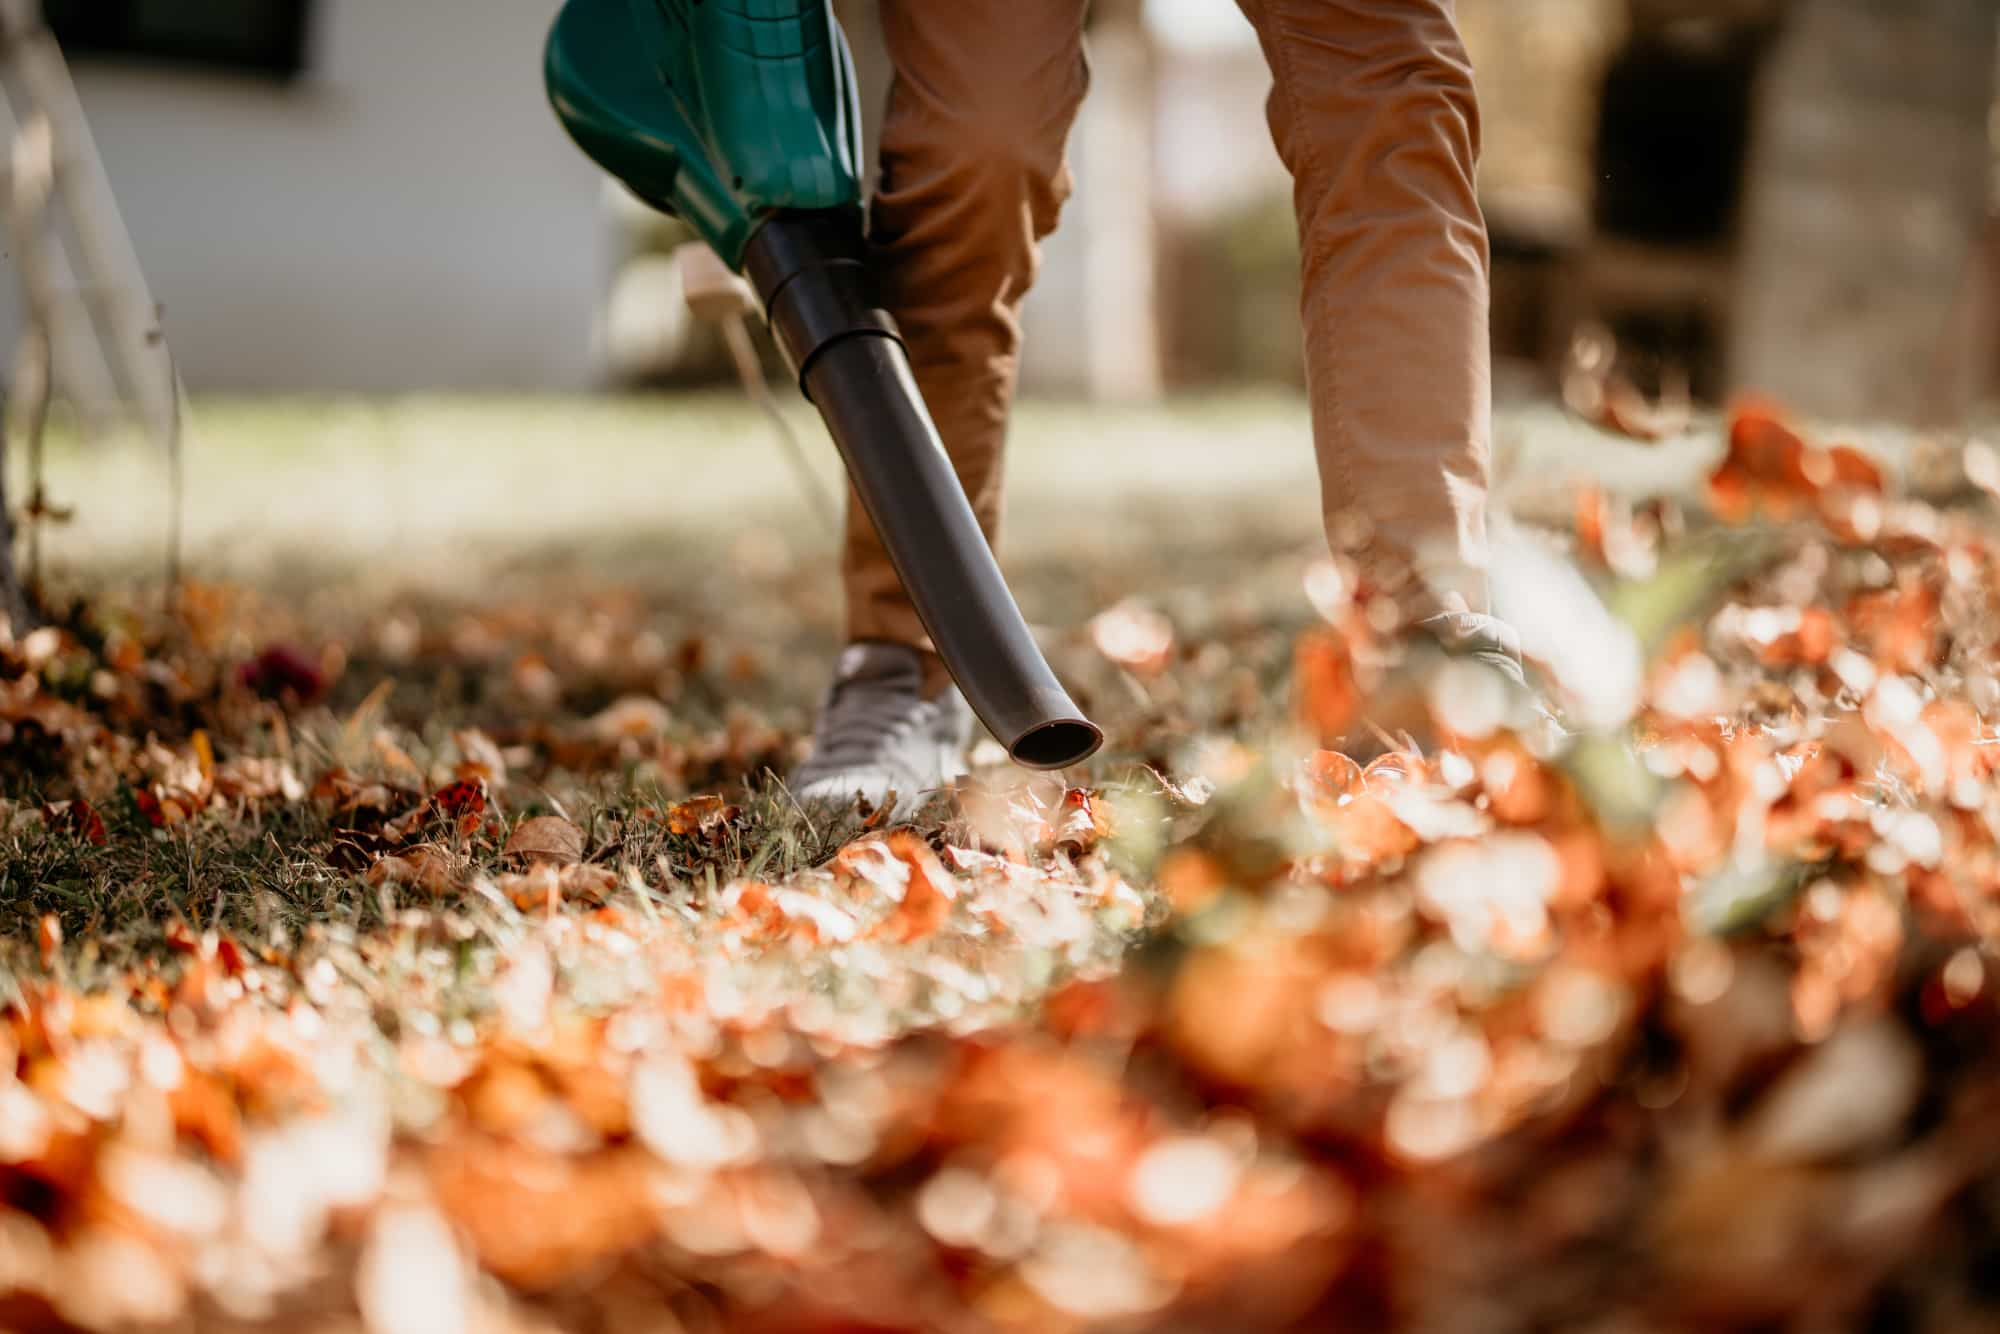 lawn pro using leaf blower for leaf cleanup